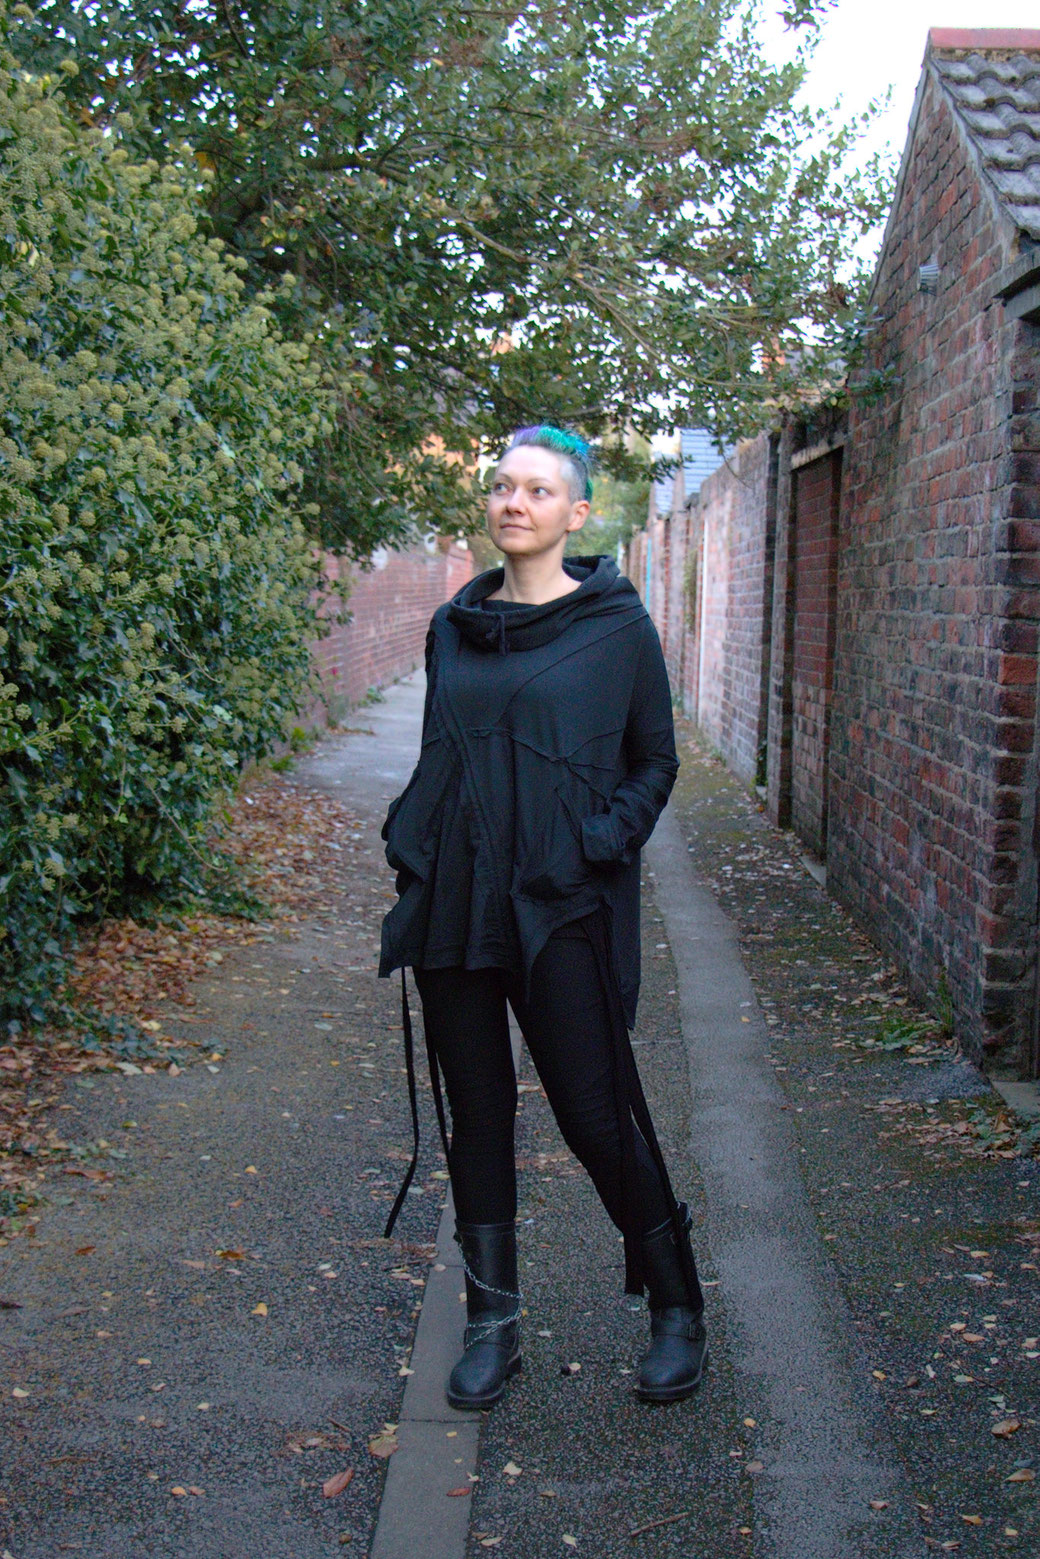 Dark post-apocalyptic outfits I wear to work - Ynhoia hoodie and Dorawyn leggings in black - Zebraspider Eco Anti-Fashion